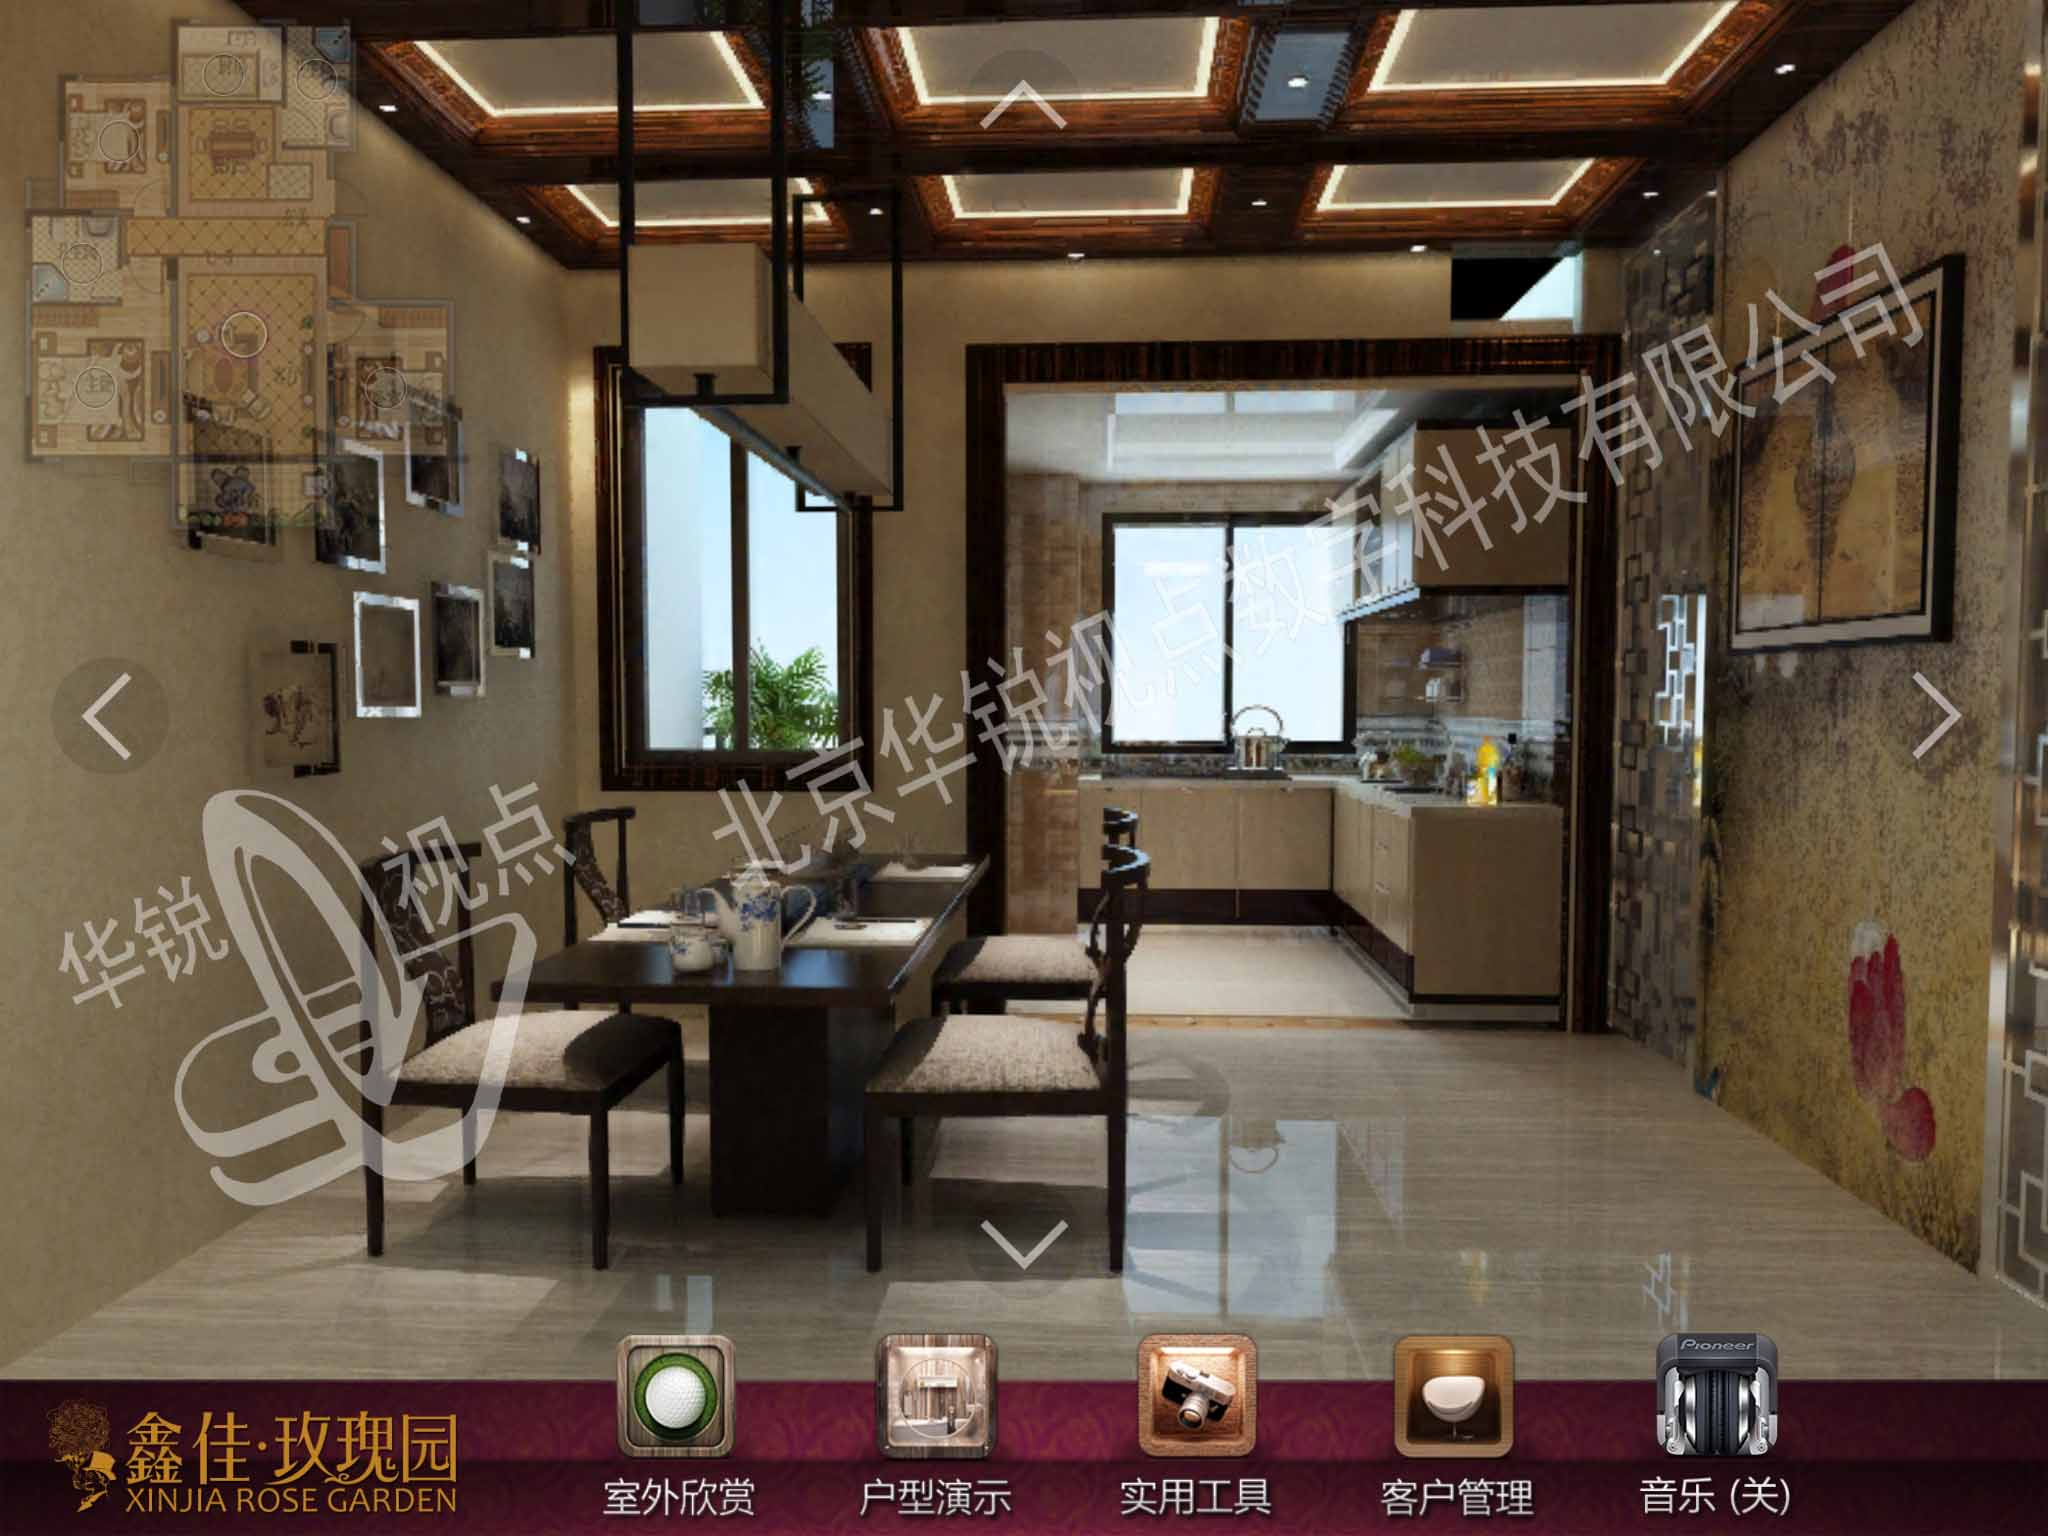 VR样板房制作,虚拟现实地产展示,上海华锐视点